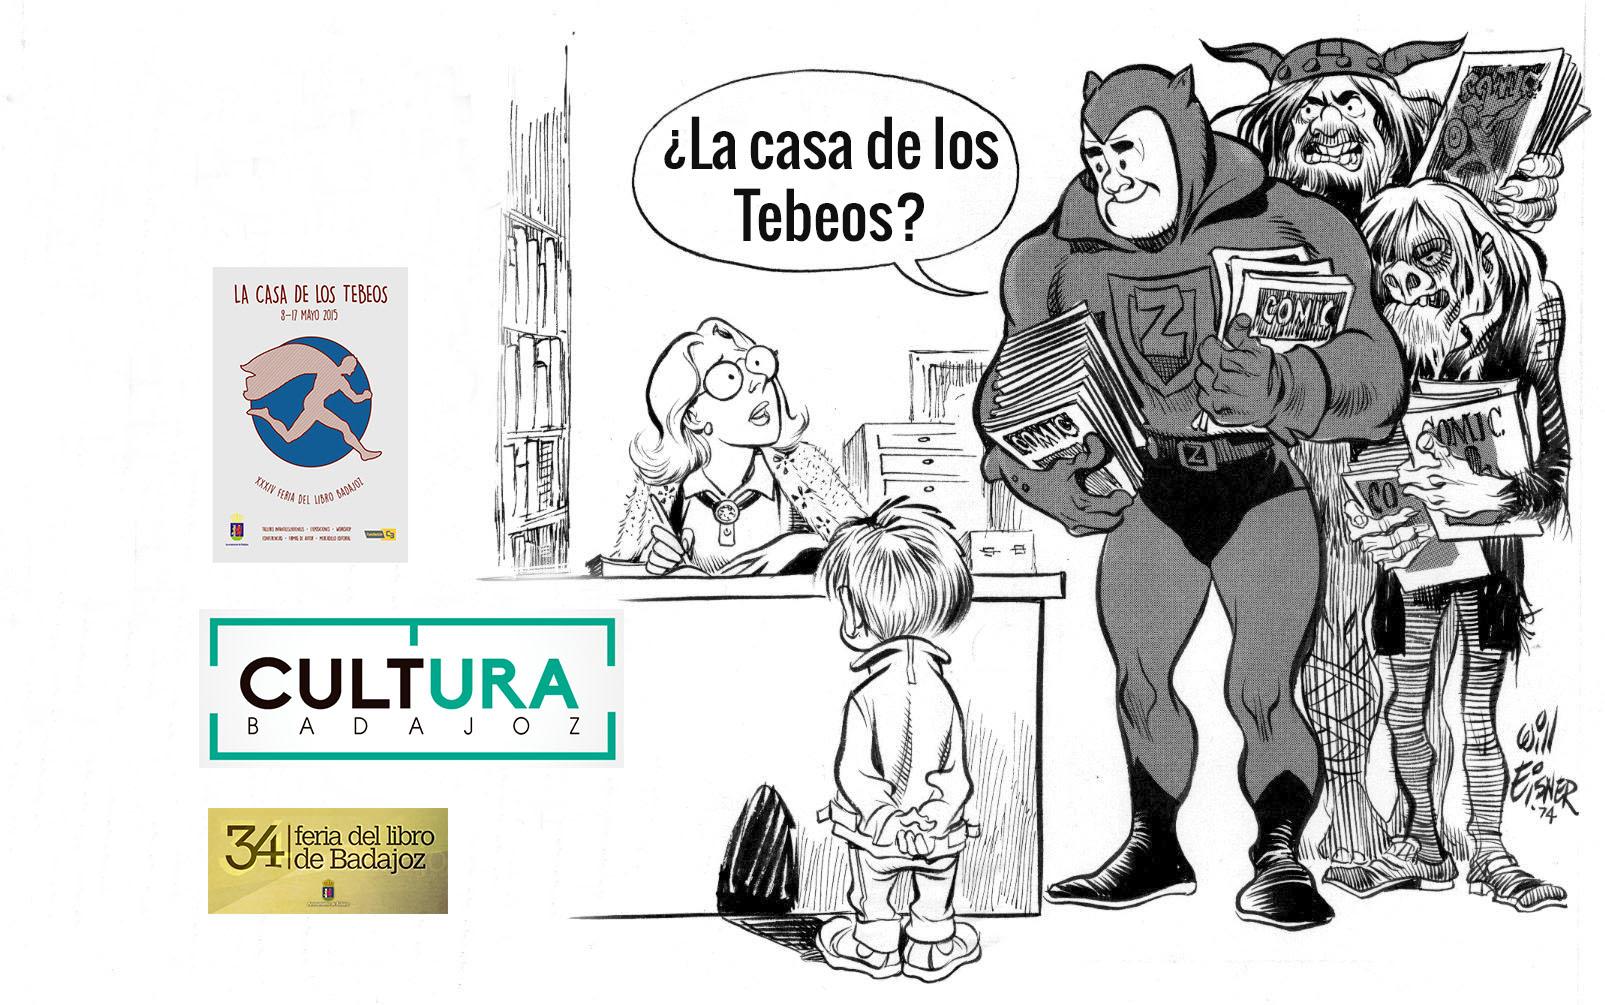 feria-libro-badajoz-tebeos-culturabadajoz